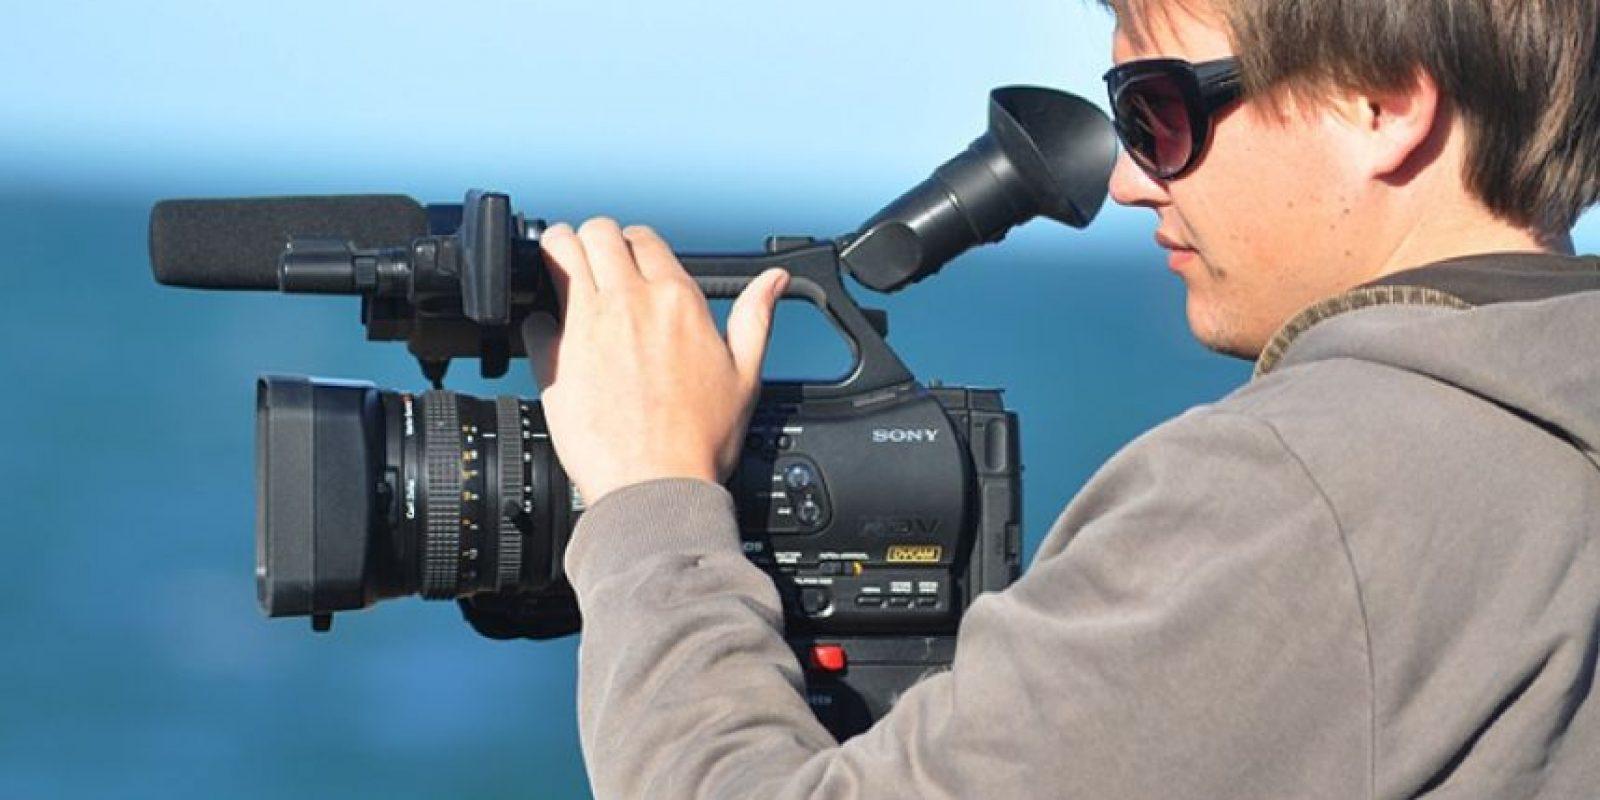 Un camarógrafo gana de 500 a 700 dólares por película. Foto:Flickr